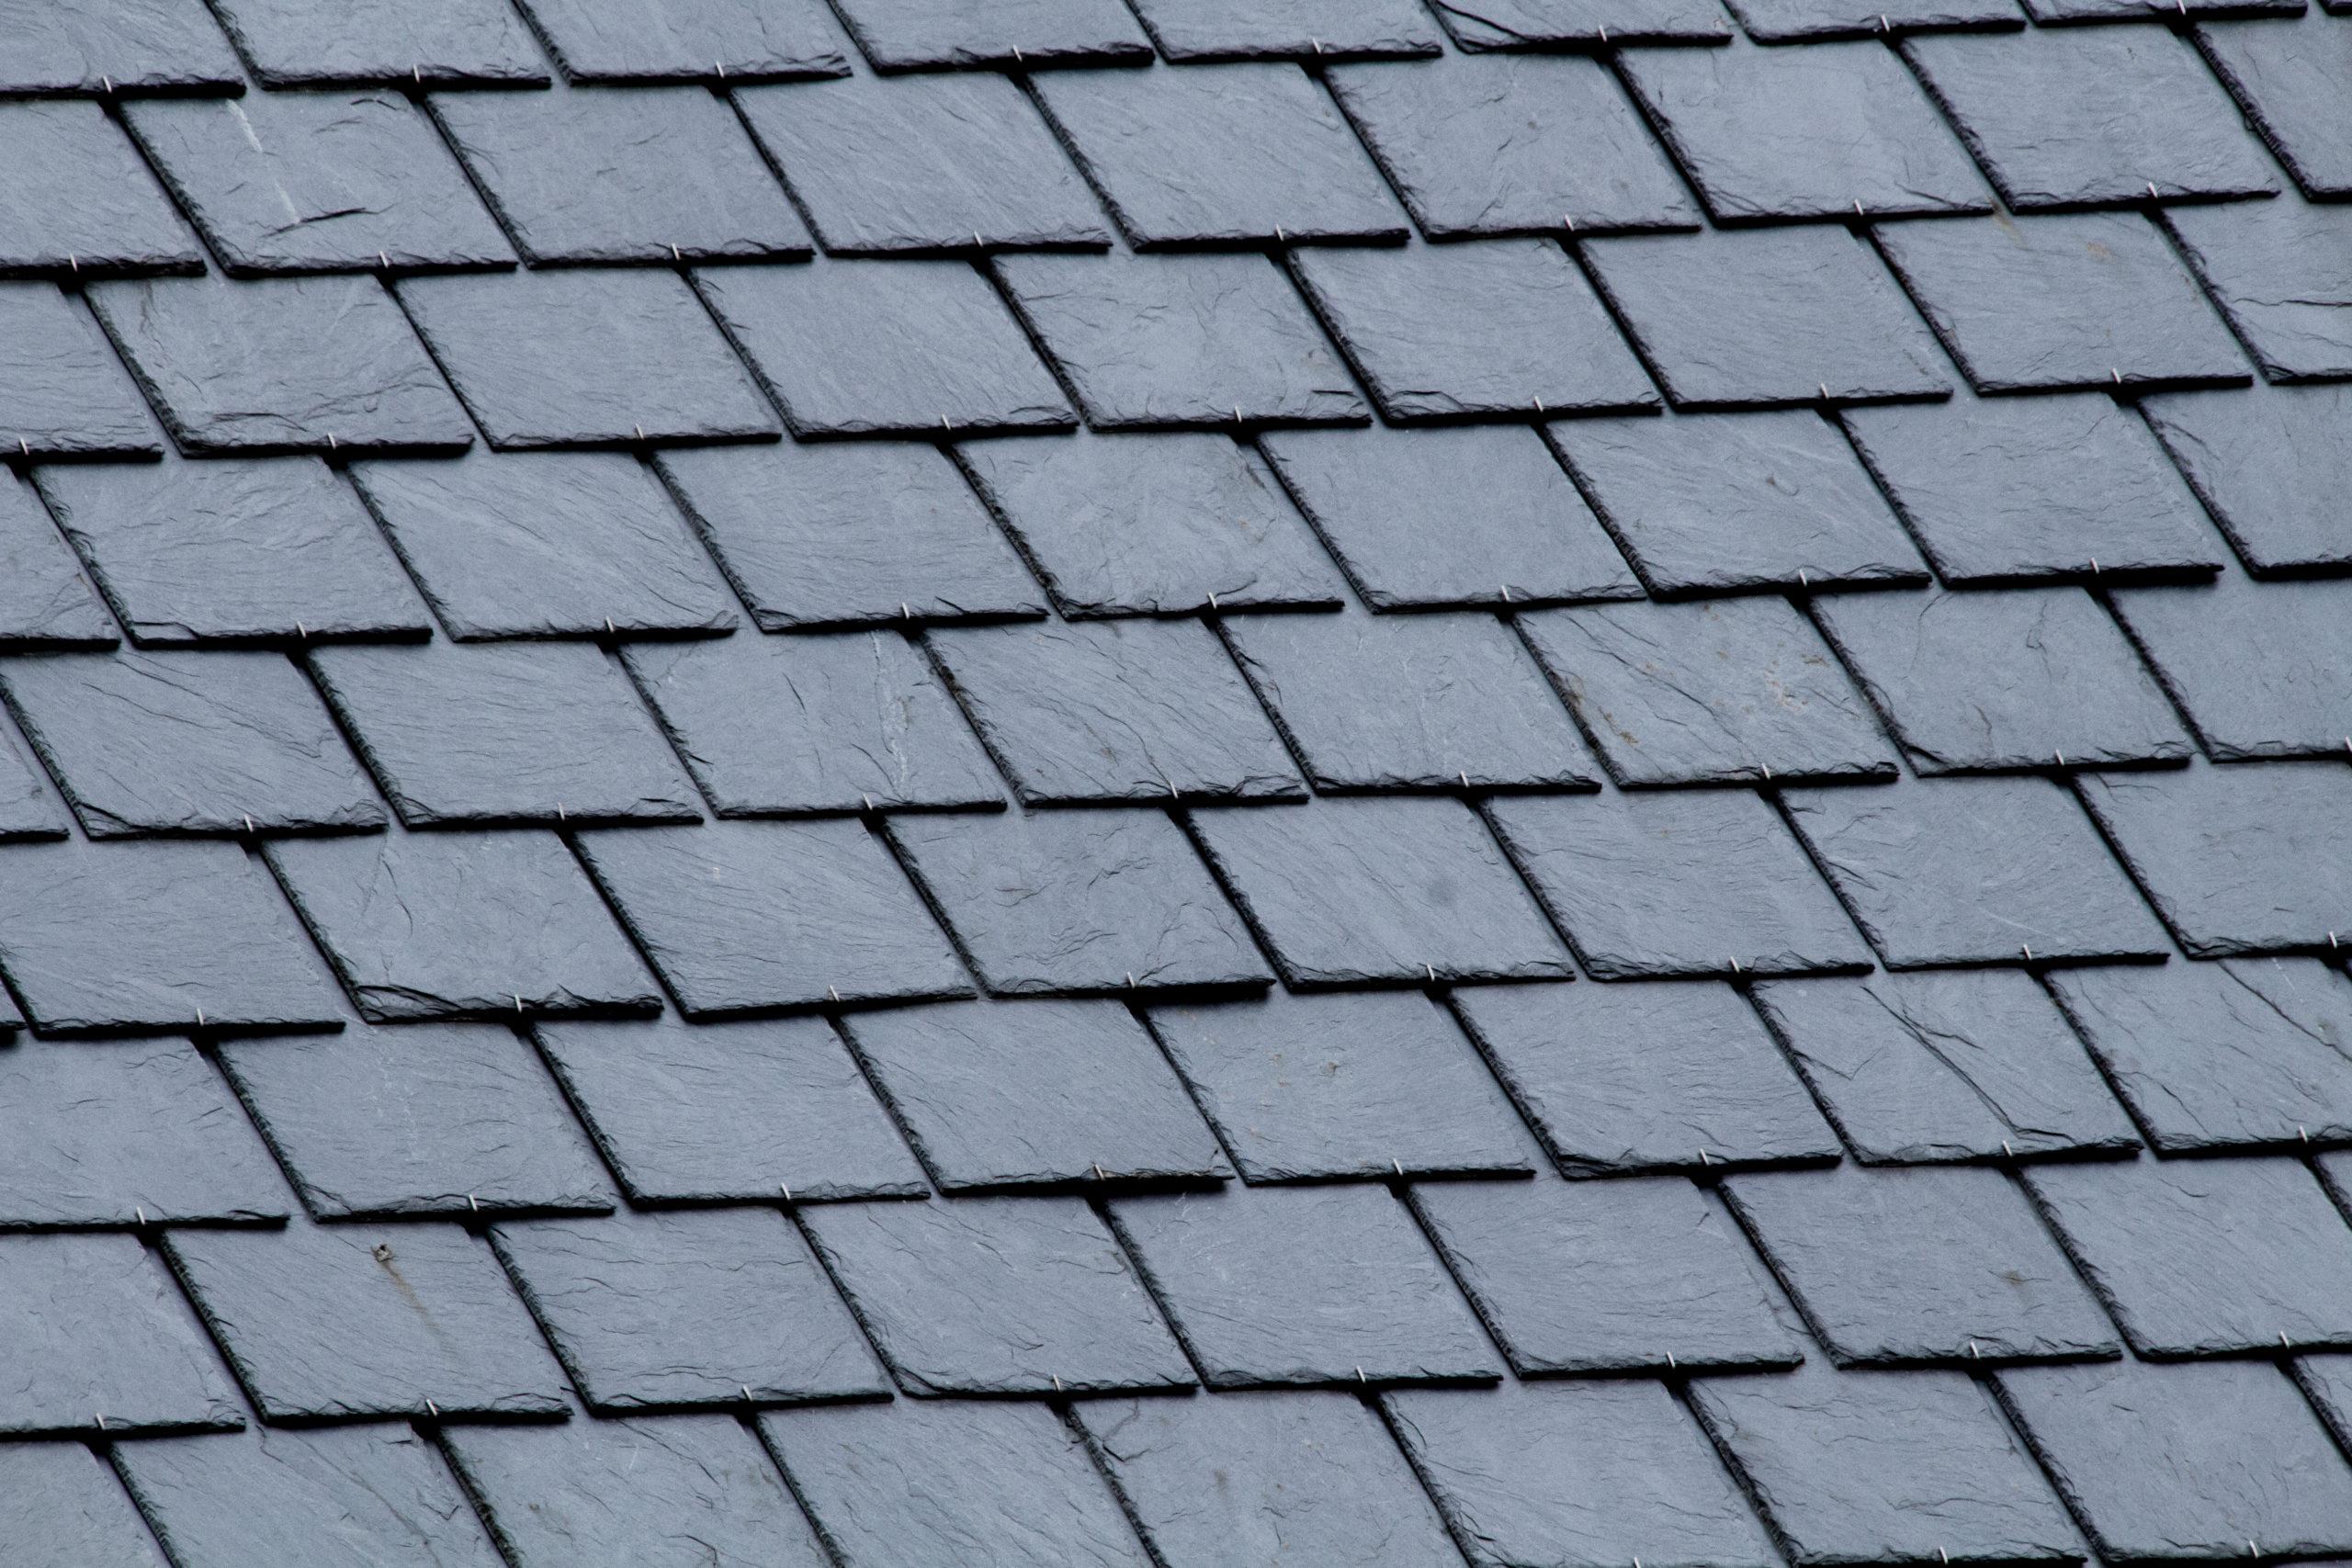 slate tile roof